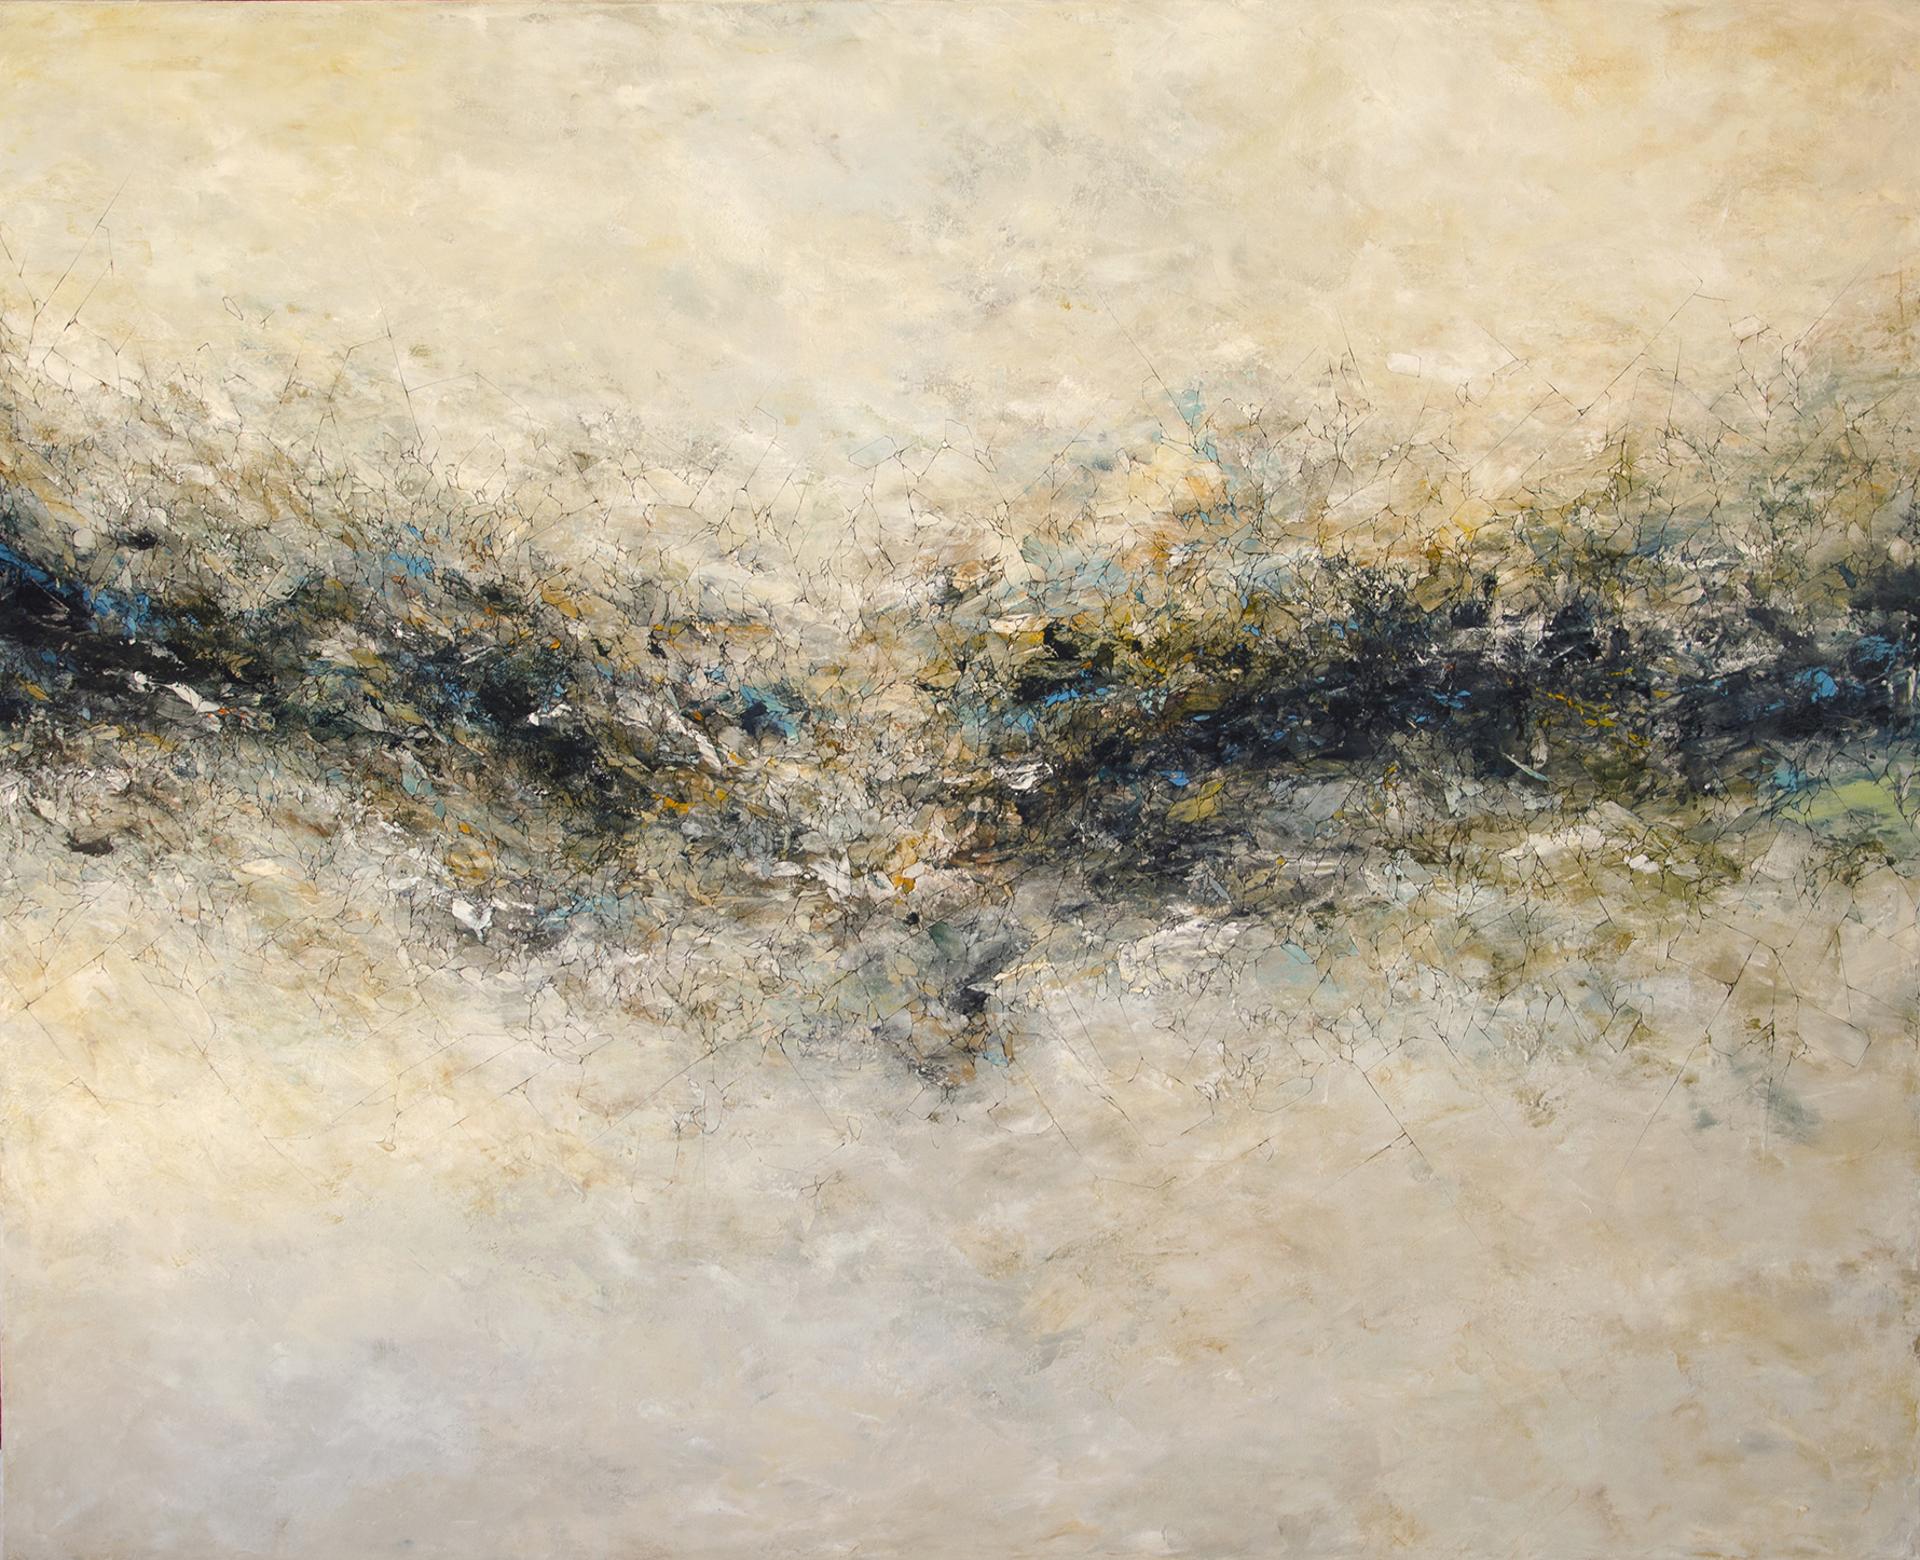 Inclination 2 - *19 by Aiden Kringen